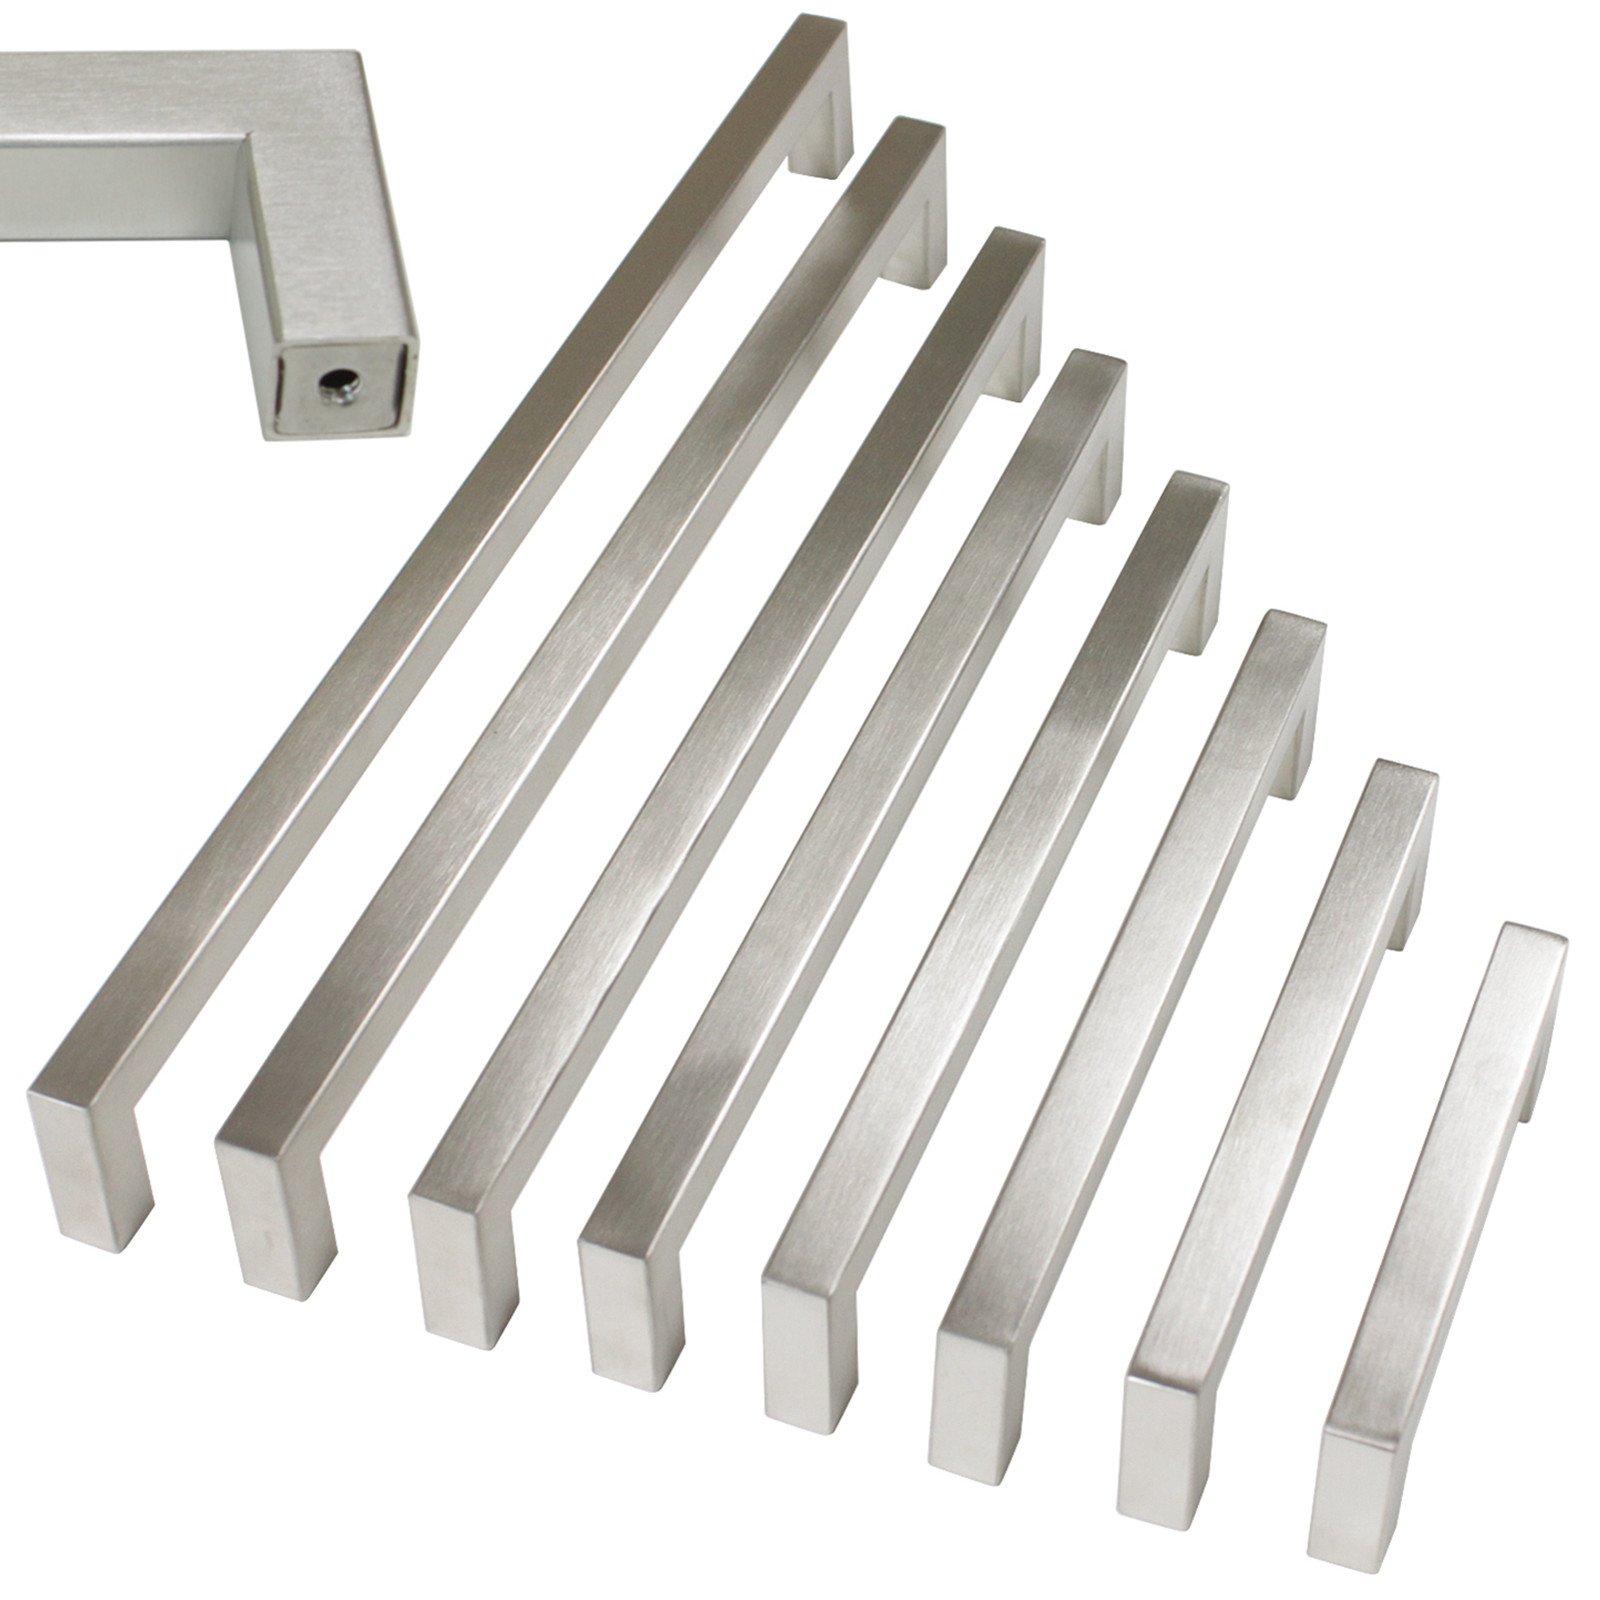 15 pack Probrico 1/2 in Stainless Steel Square Corner Bar Kitchen Cabinet Door Handles Brusehd Satin Nickel Hole Centers 6-1/4 inch 160mm